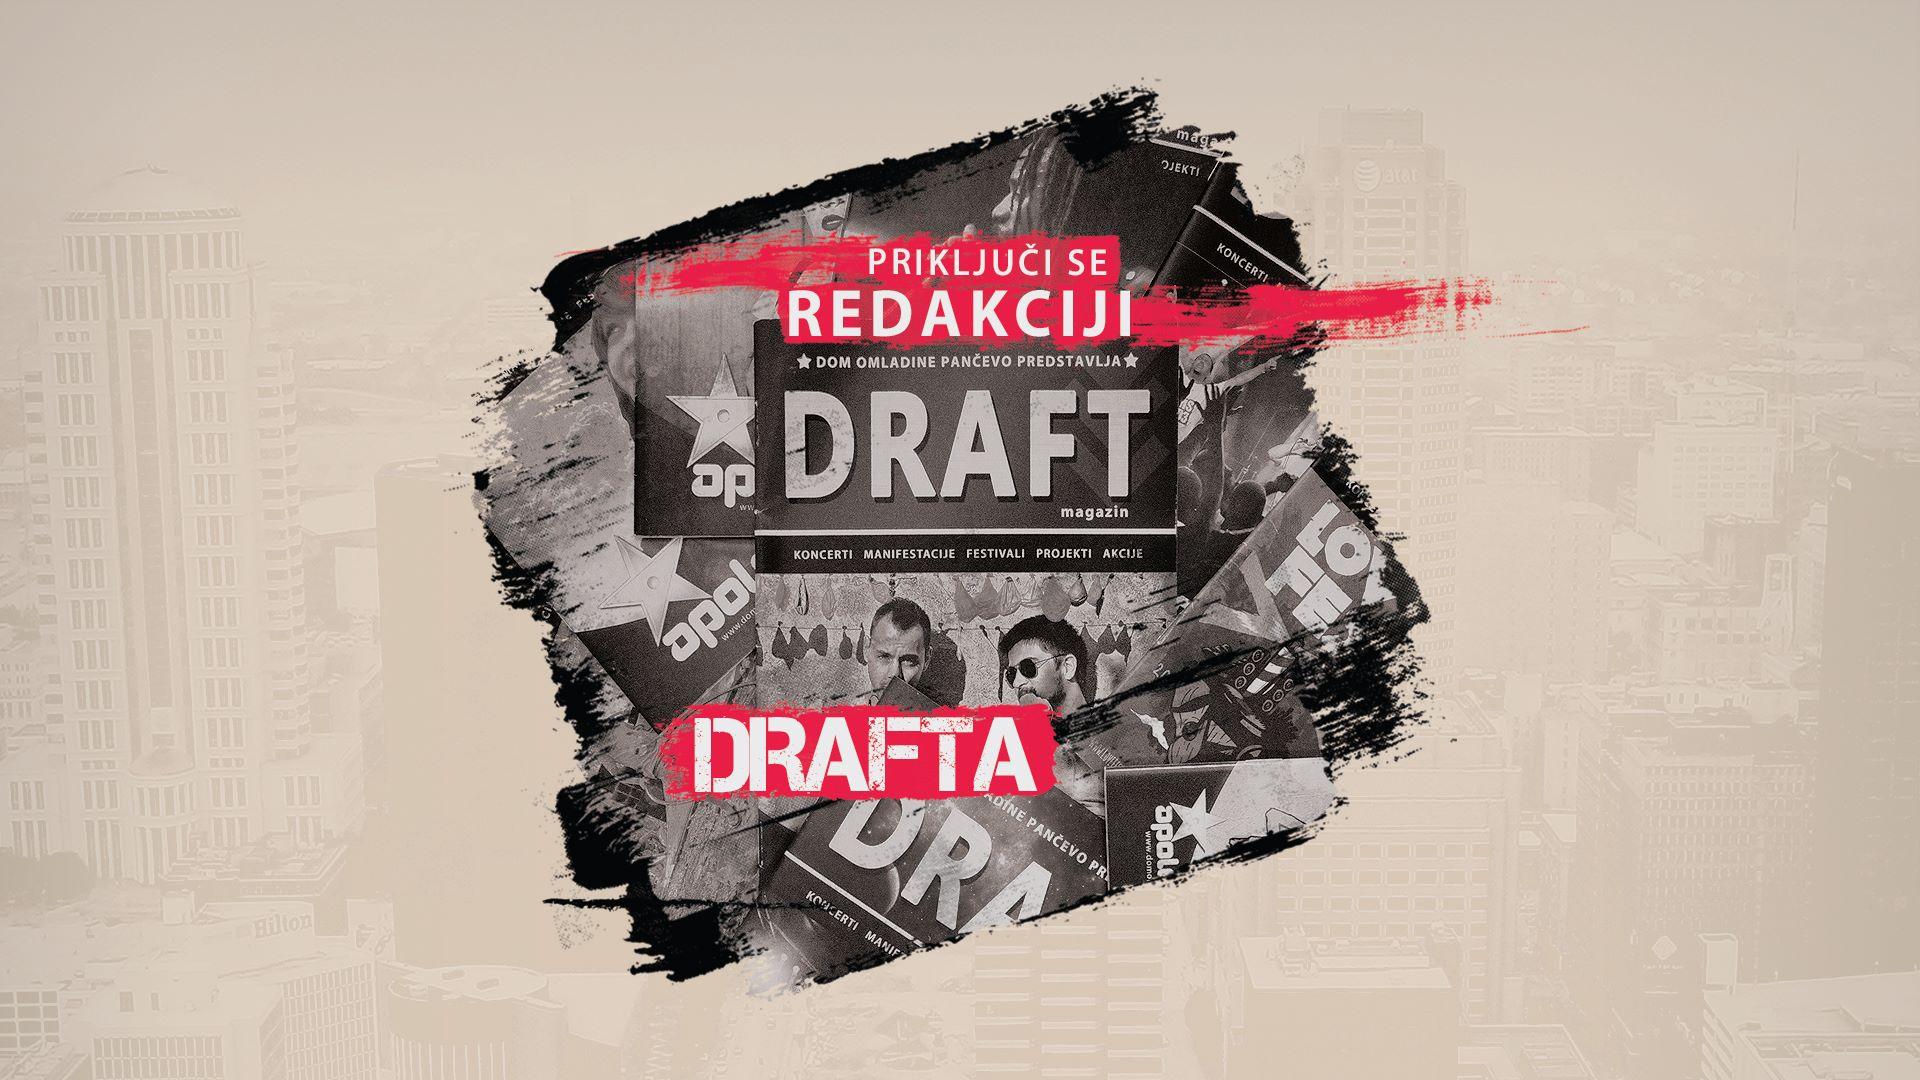 Poziv na Draft konkurs